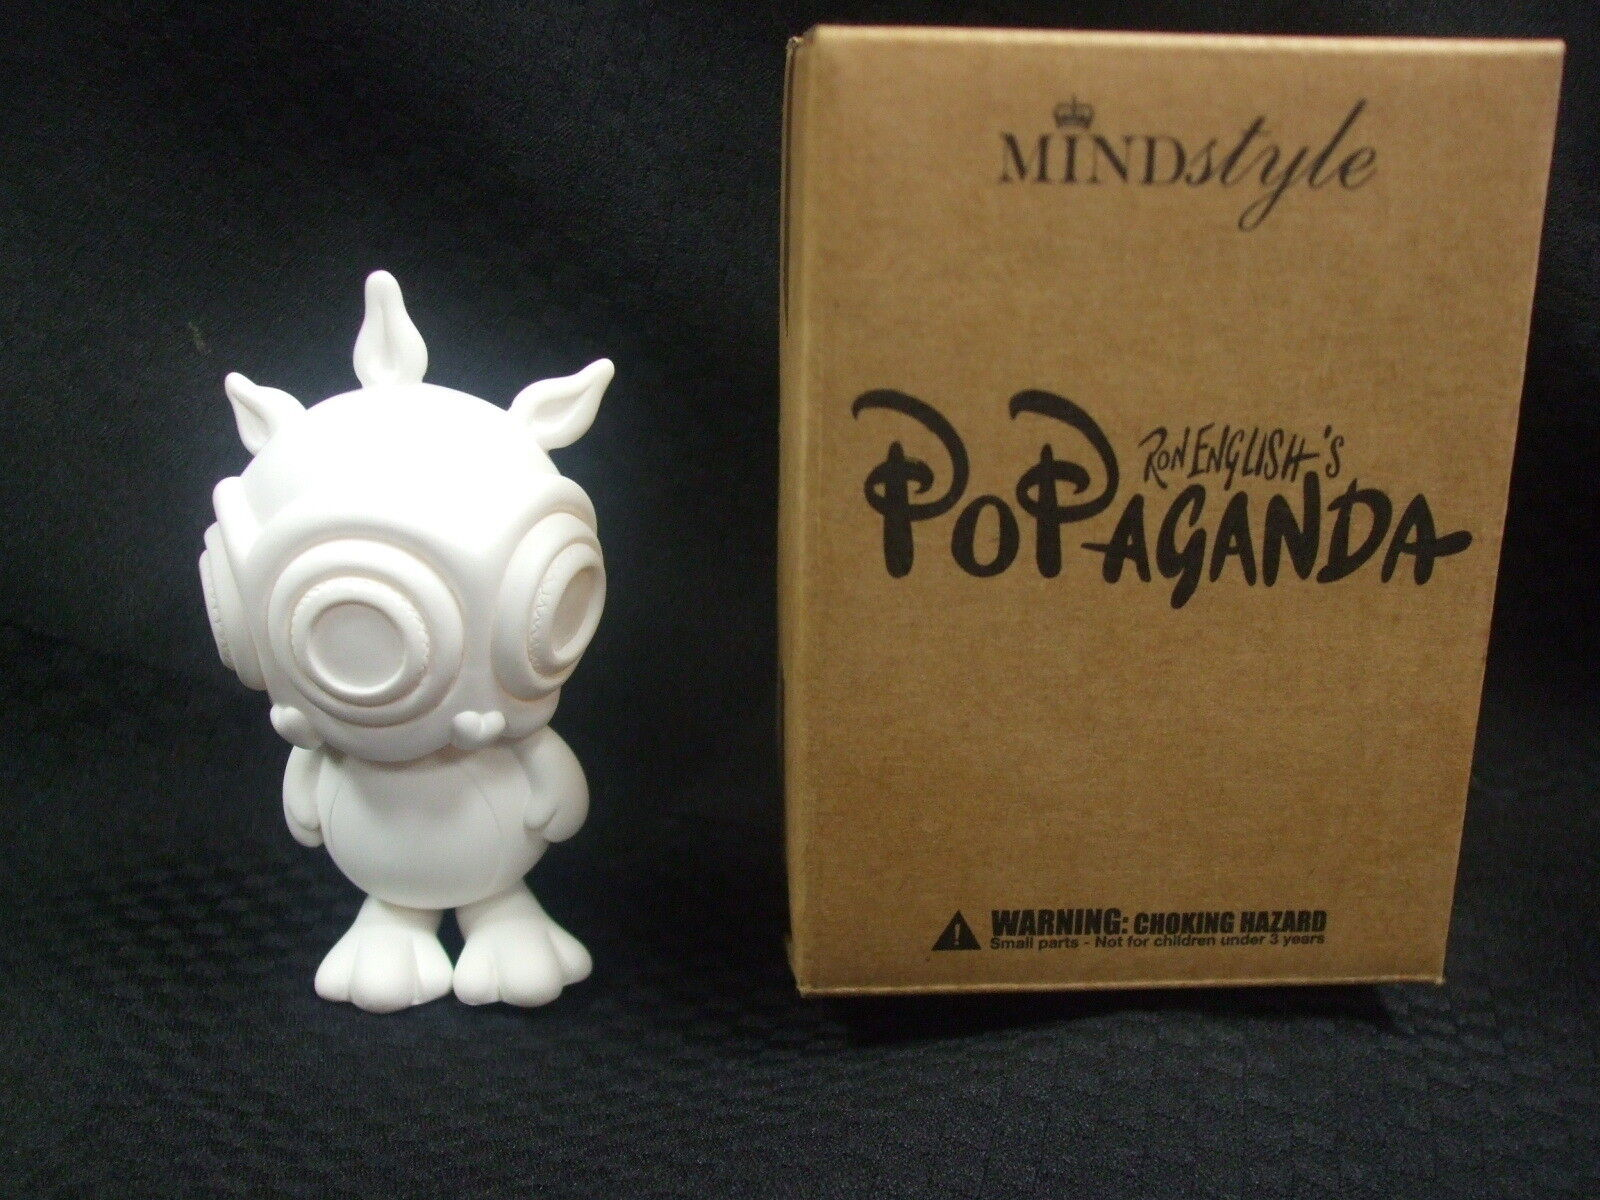 2009 Ron English POPaganda Mini Ronnnie Rabbbit - All bianca Chase Figure w/ Box